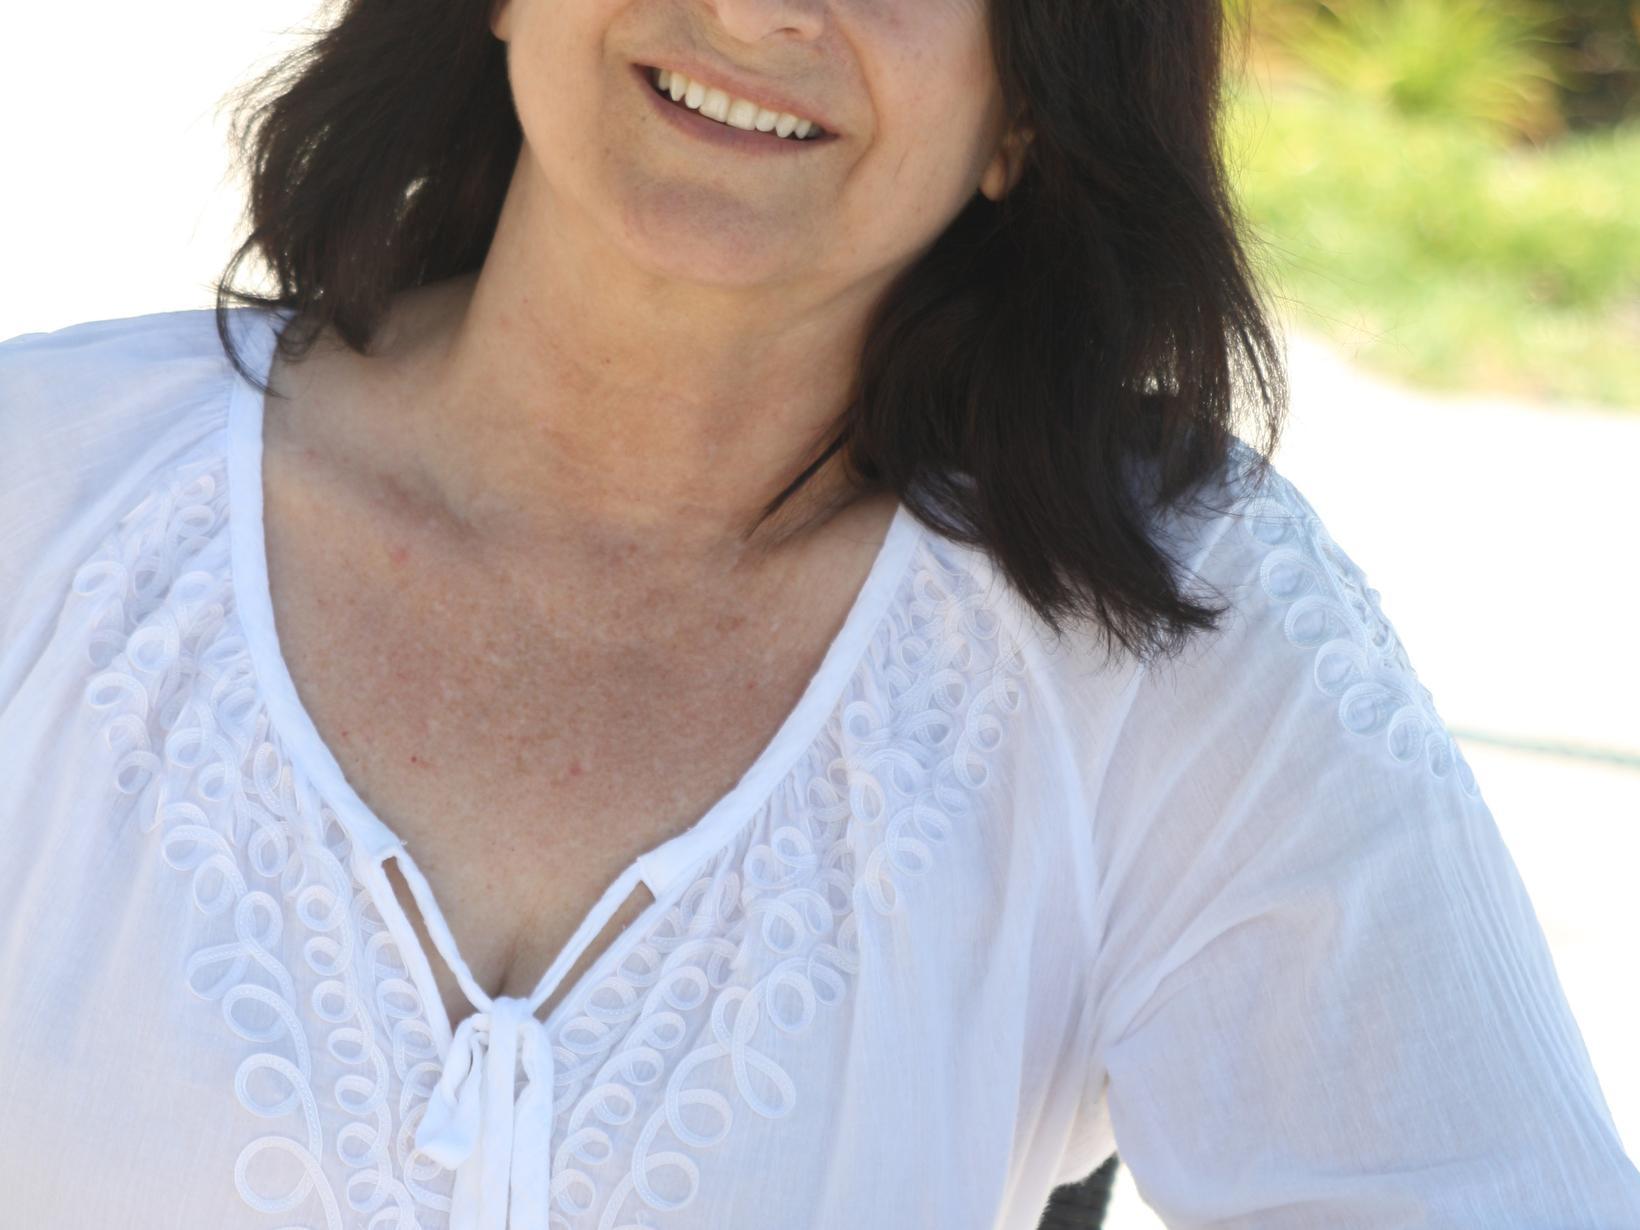 Catherine from Folsom, California, United States